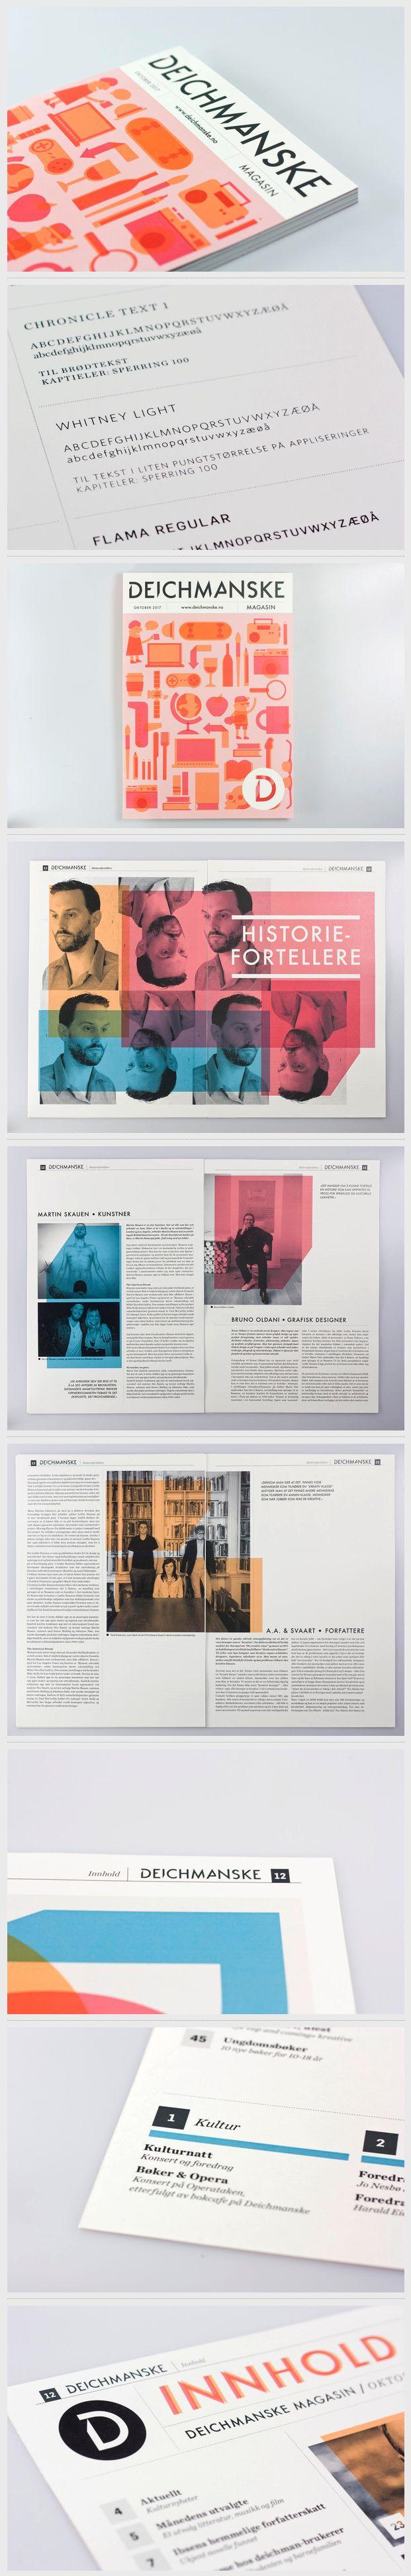 Editorial Design - Deichmanske Magazine